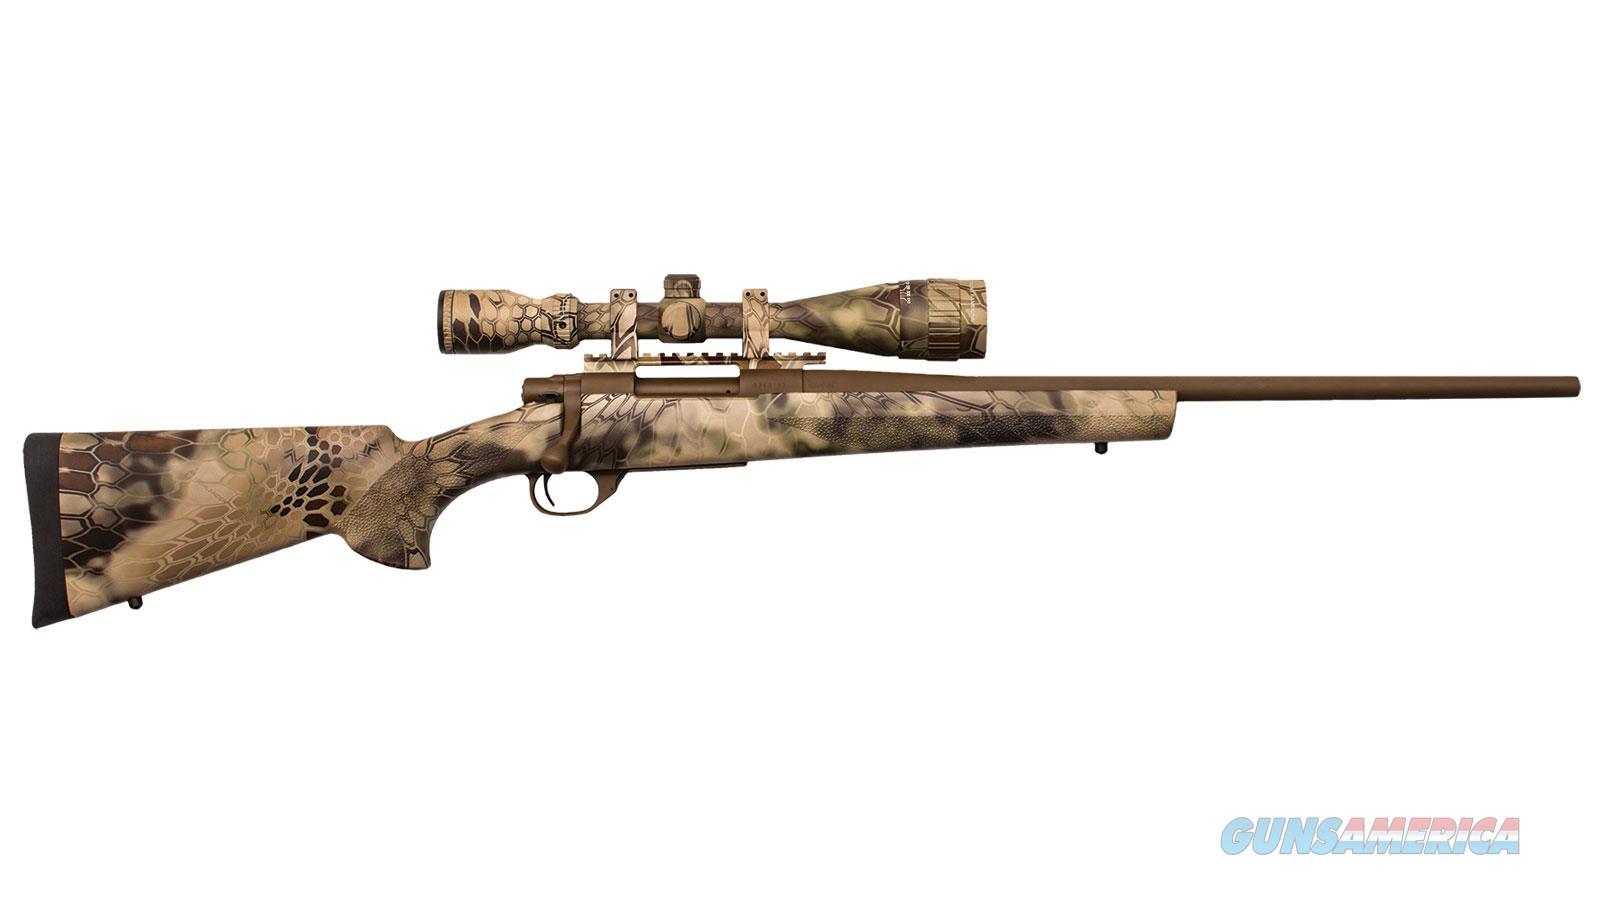 Legacy Sports Hogue Kryp Ltwt Pkg 22-250 HKF36407KH+AB  Guns > Rifles > L Misc Rifles